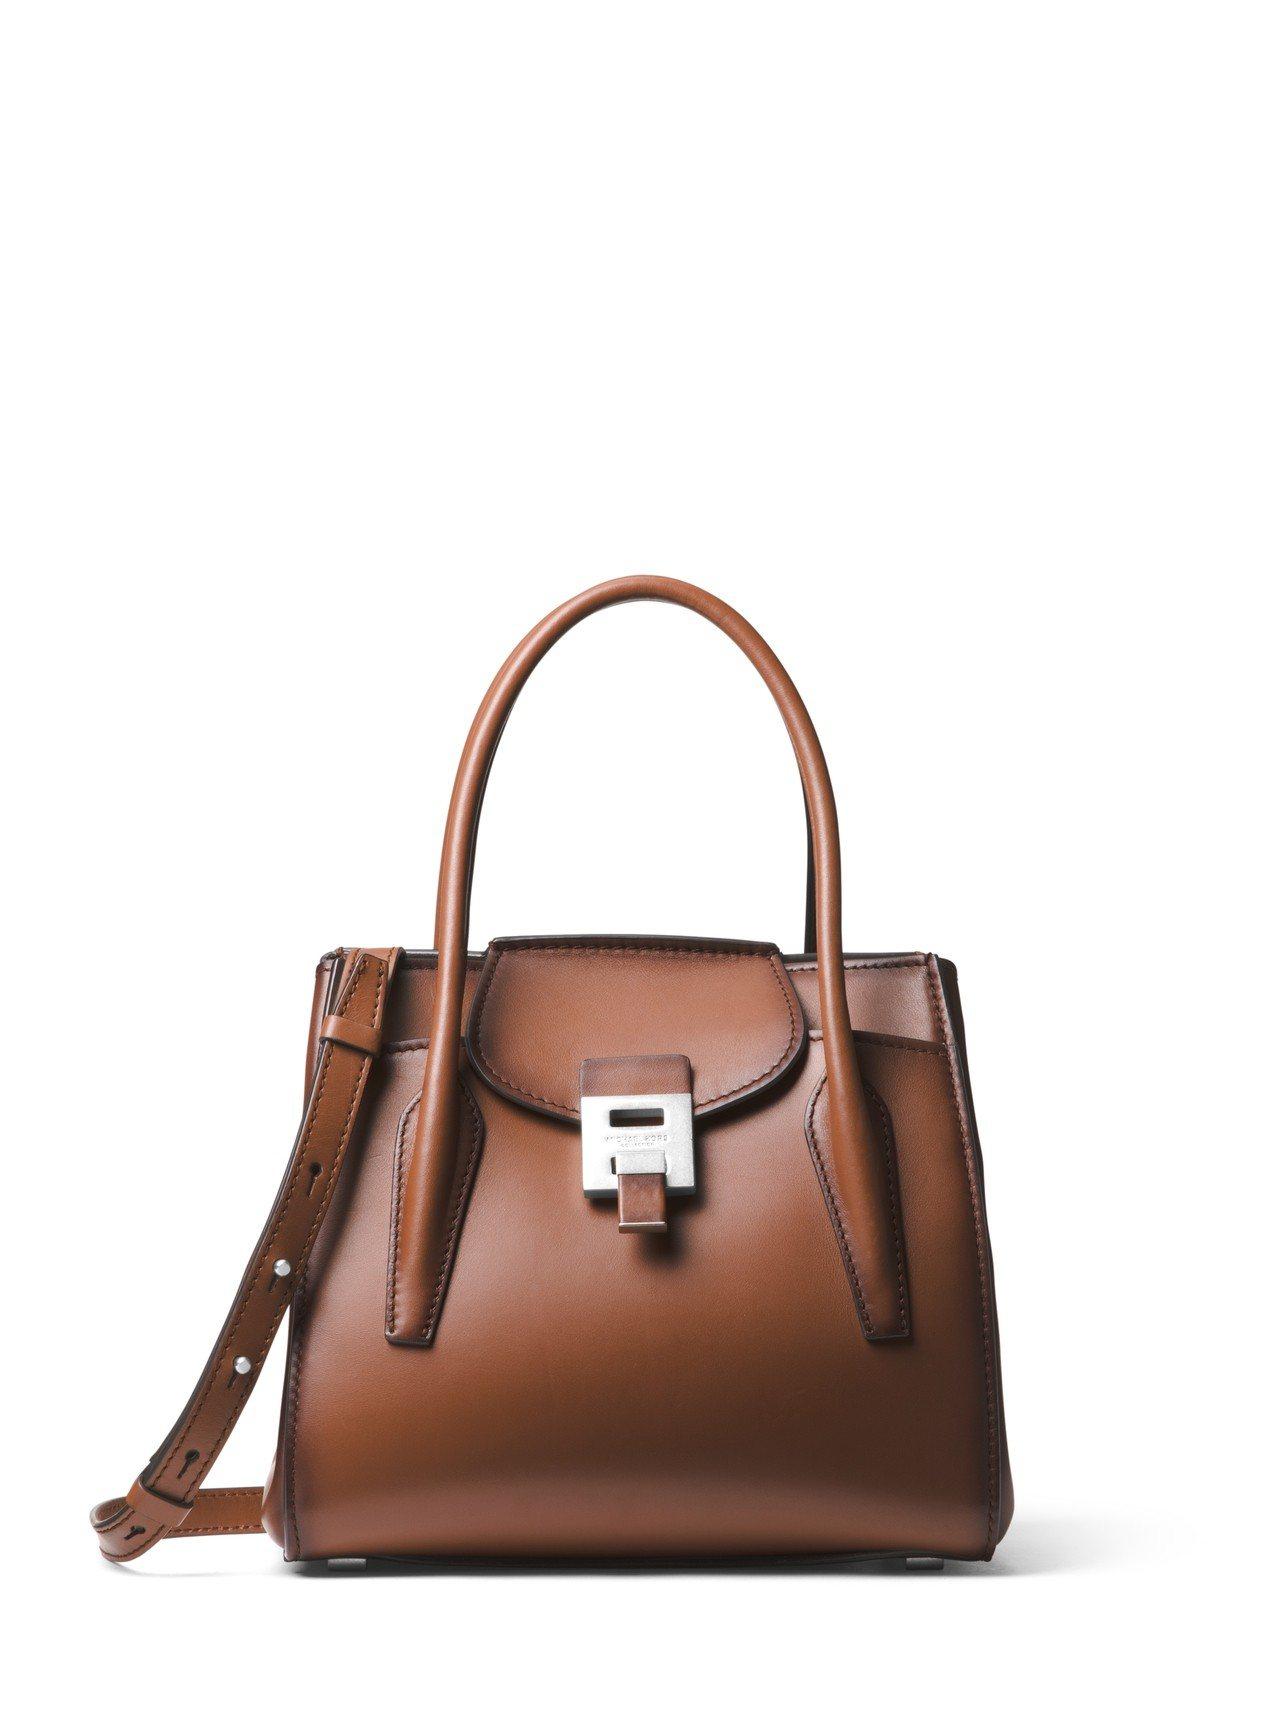 Bancroft義大利牛皮馬鞍色提包,售價48,900元。圖/MICHAEL K...